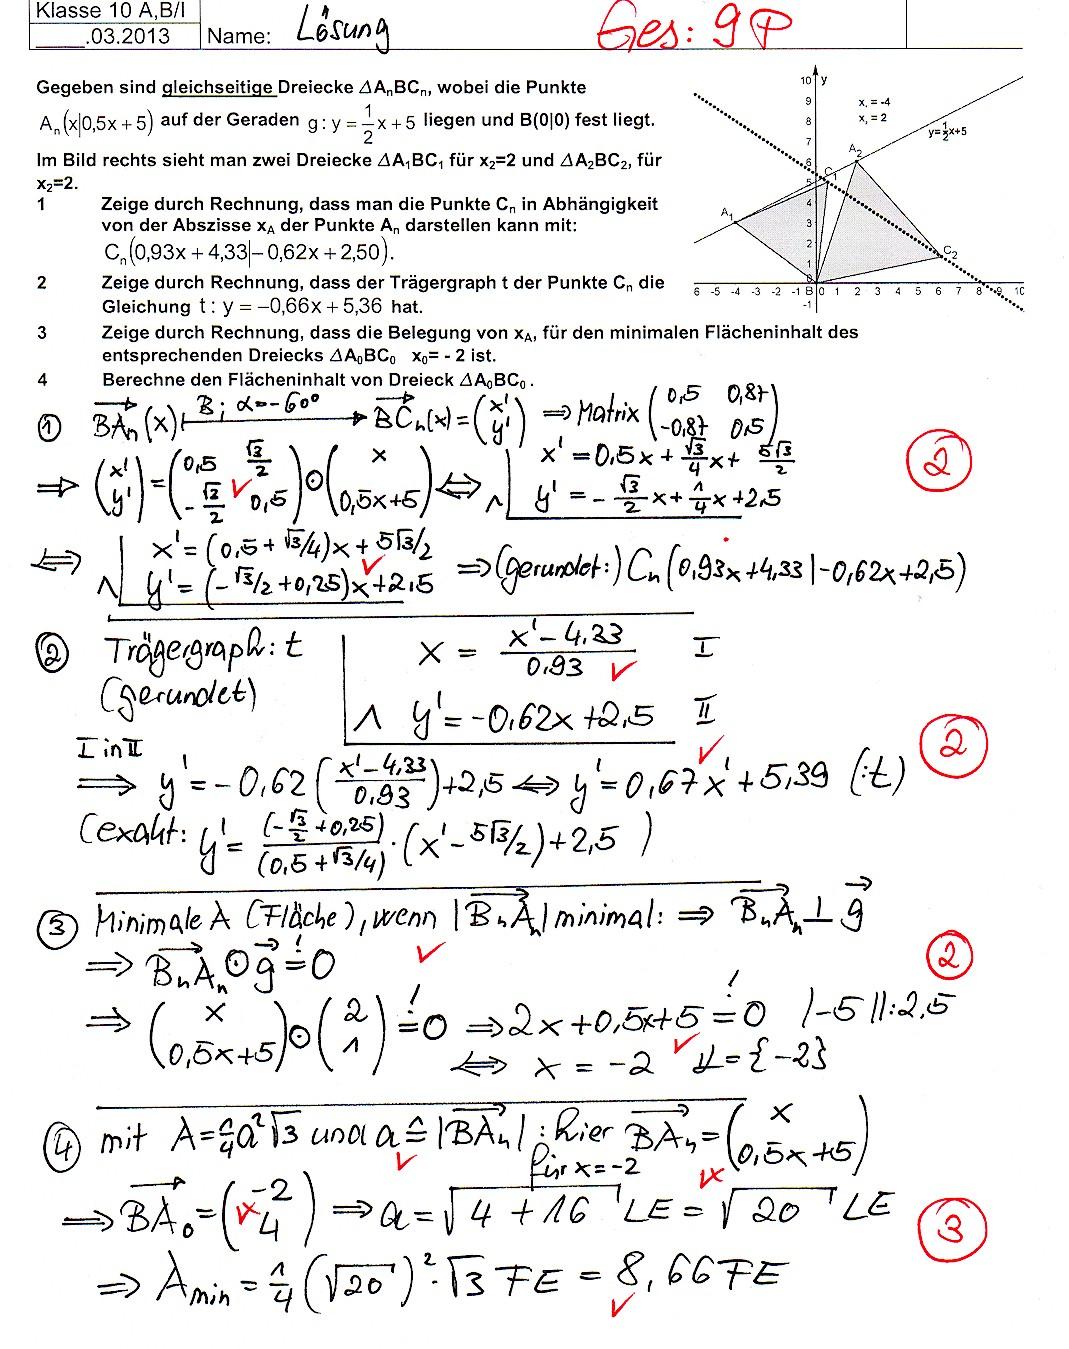 arbeitsblatt vorschule 187 mathe aufgaben klasse 4 gem228lde